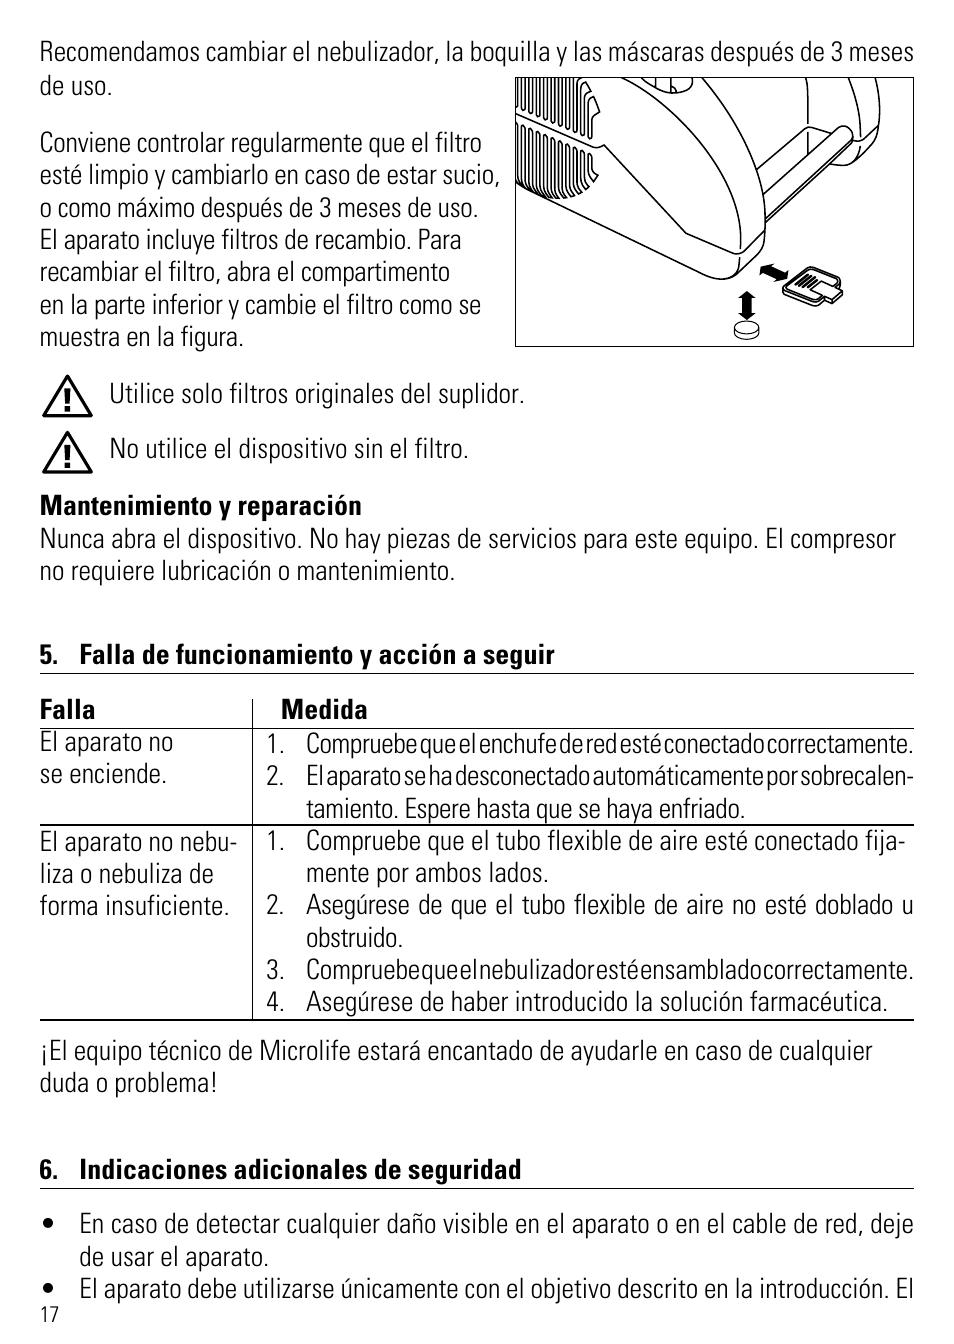 Microlife инструкция neb 50